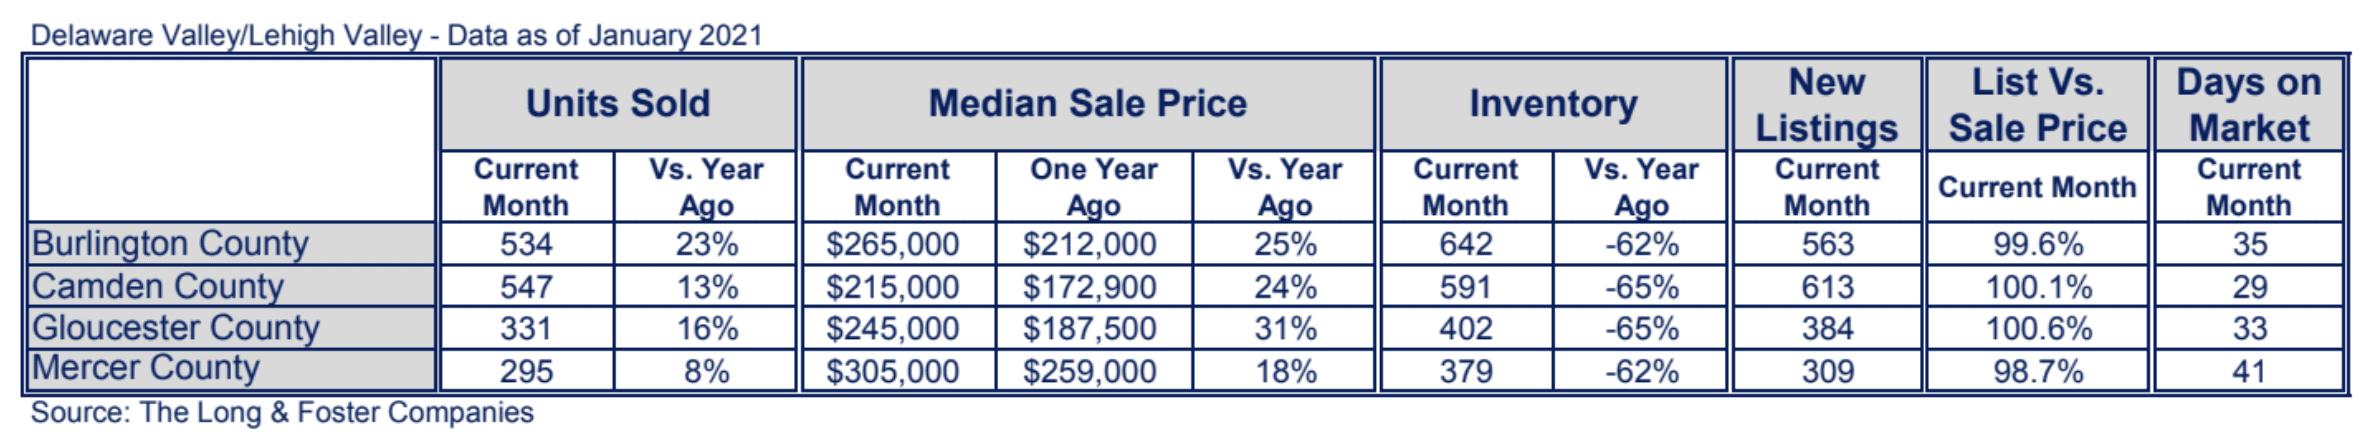 New Jersey Suburbs Market Minute Chart January 2021